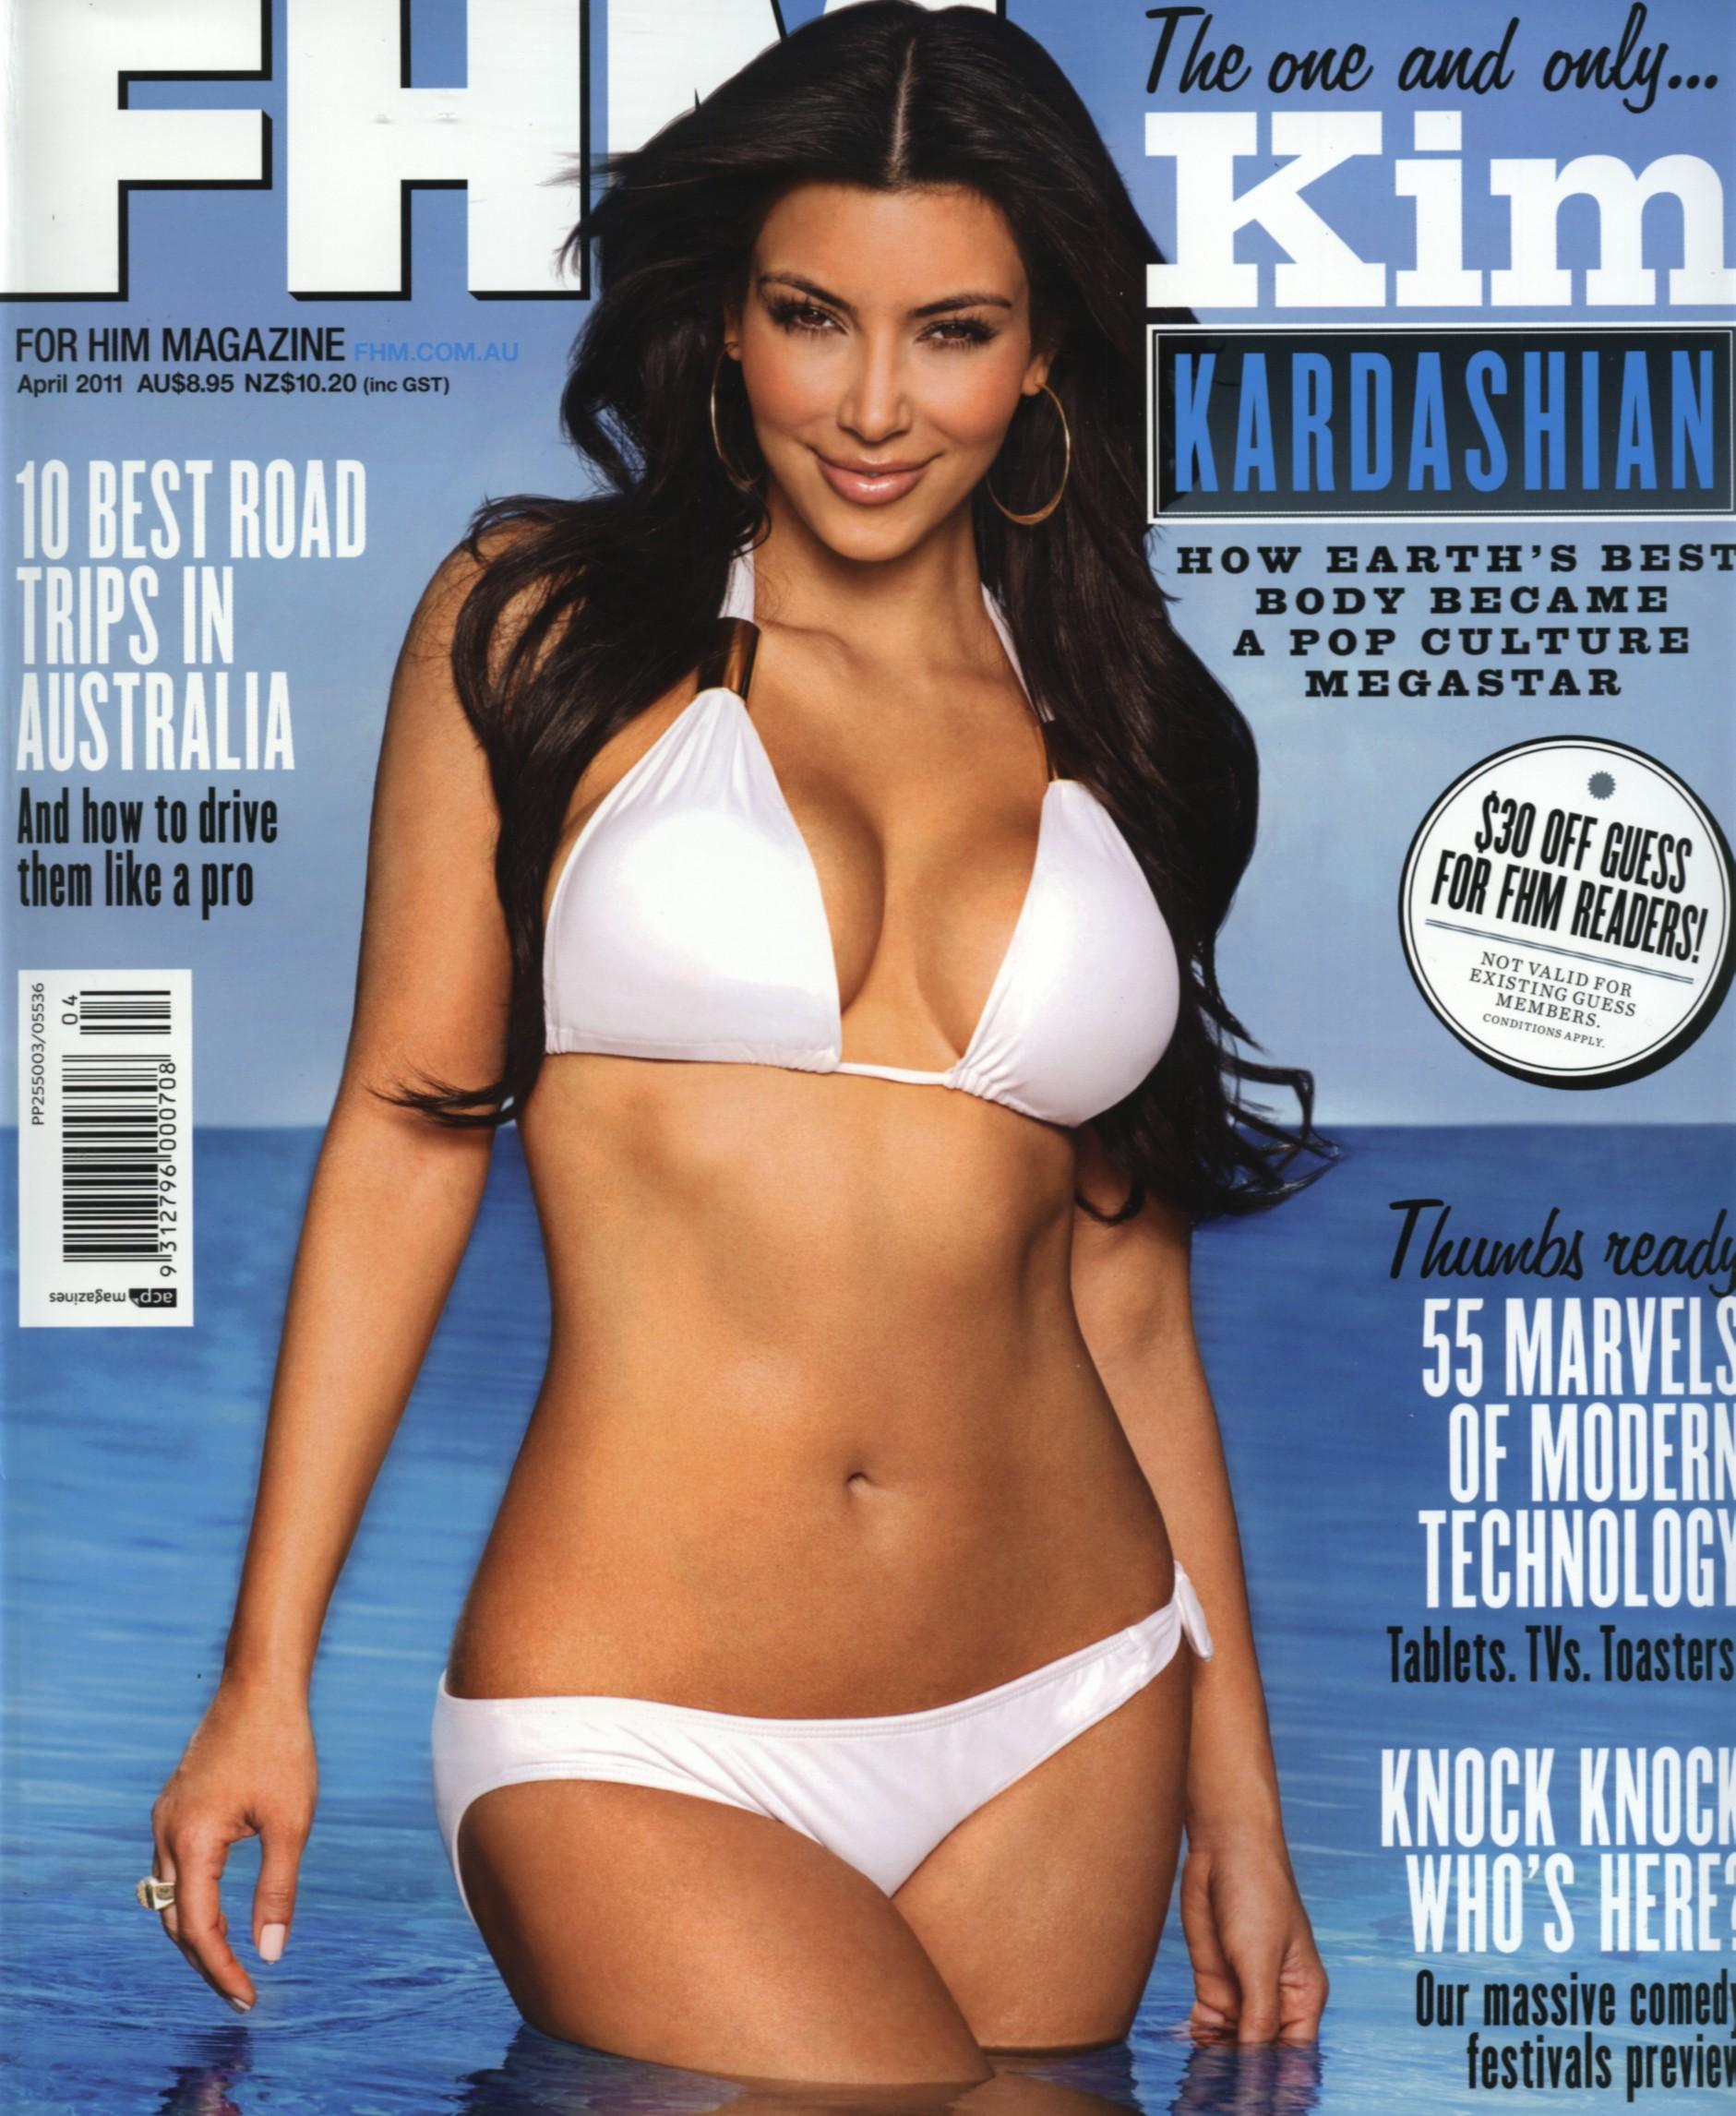 Kim kardashian modeling agency